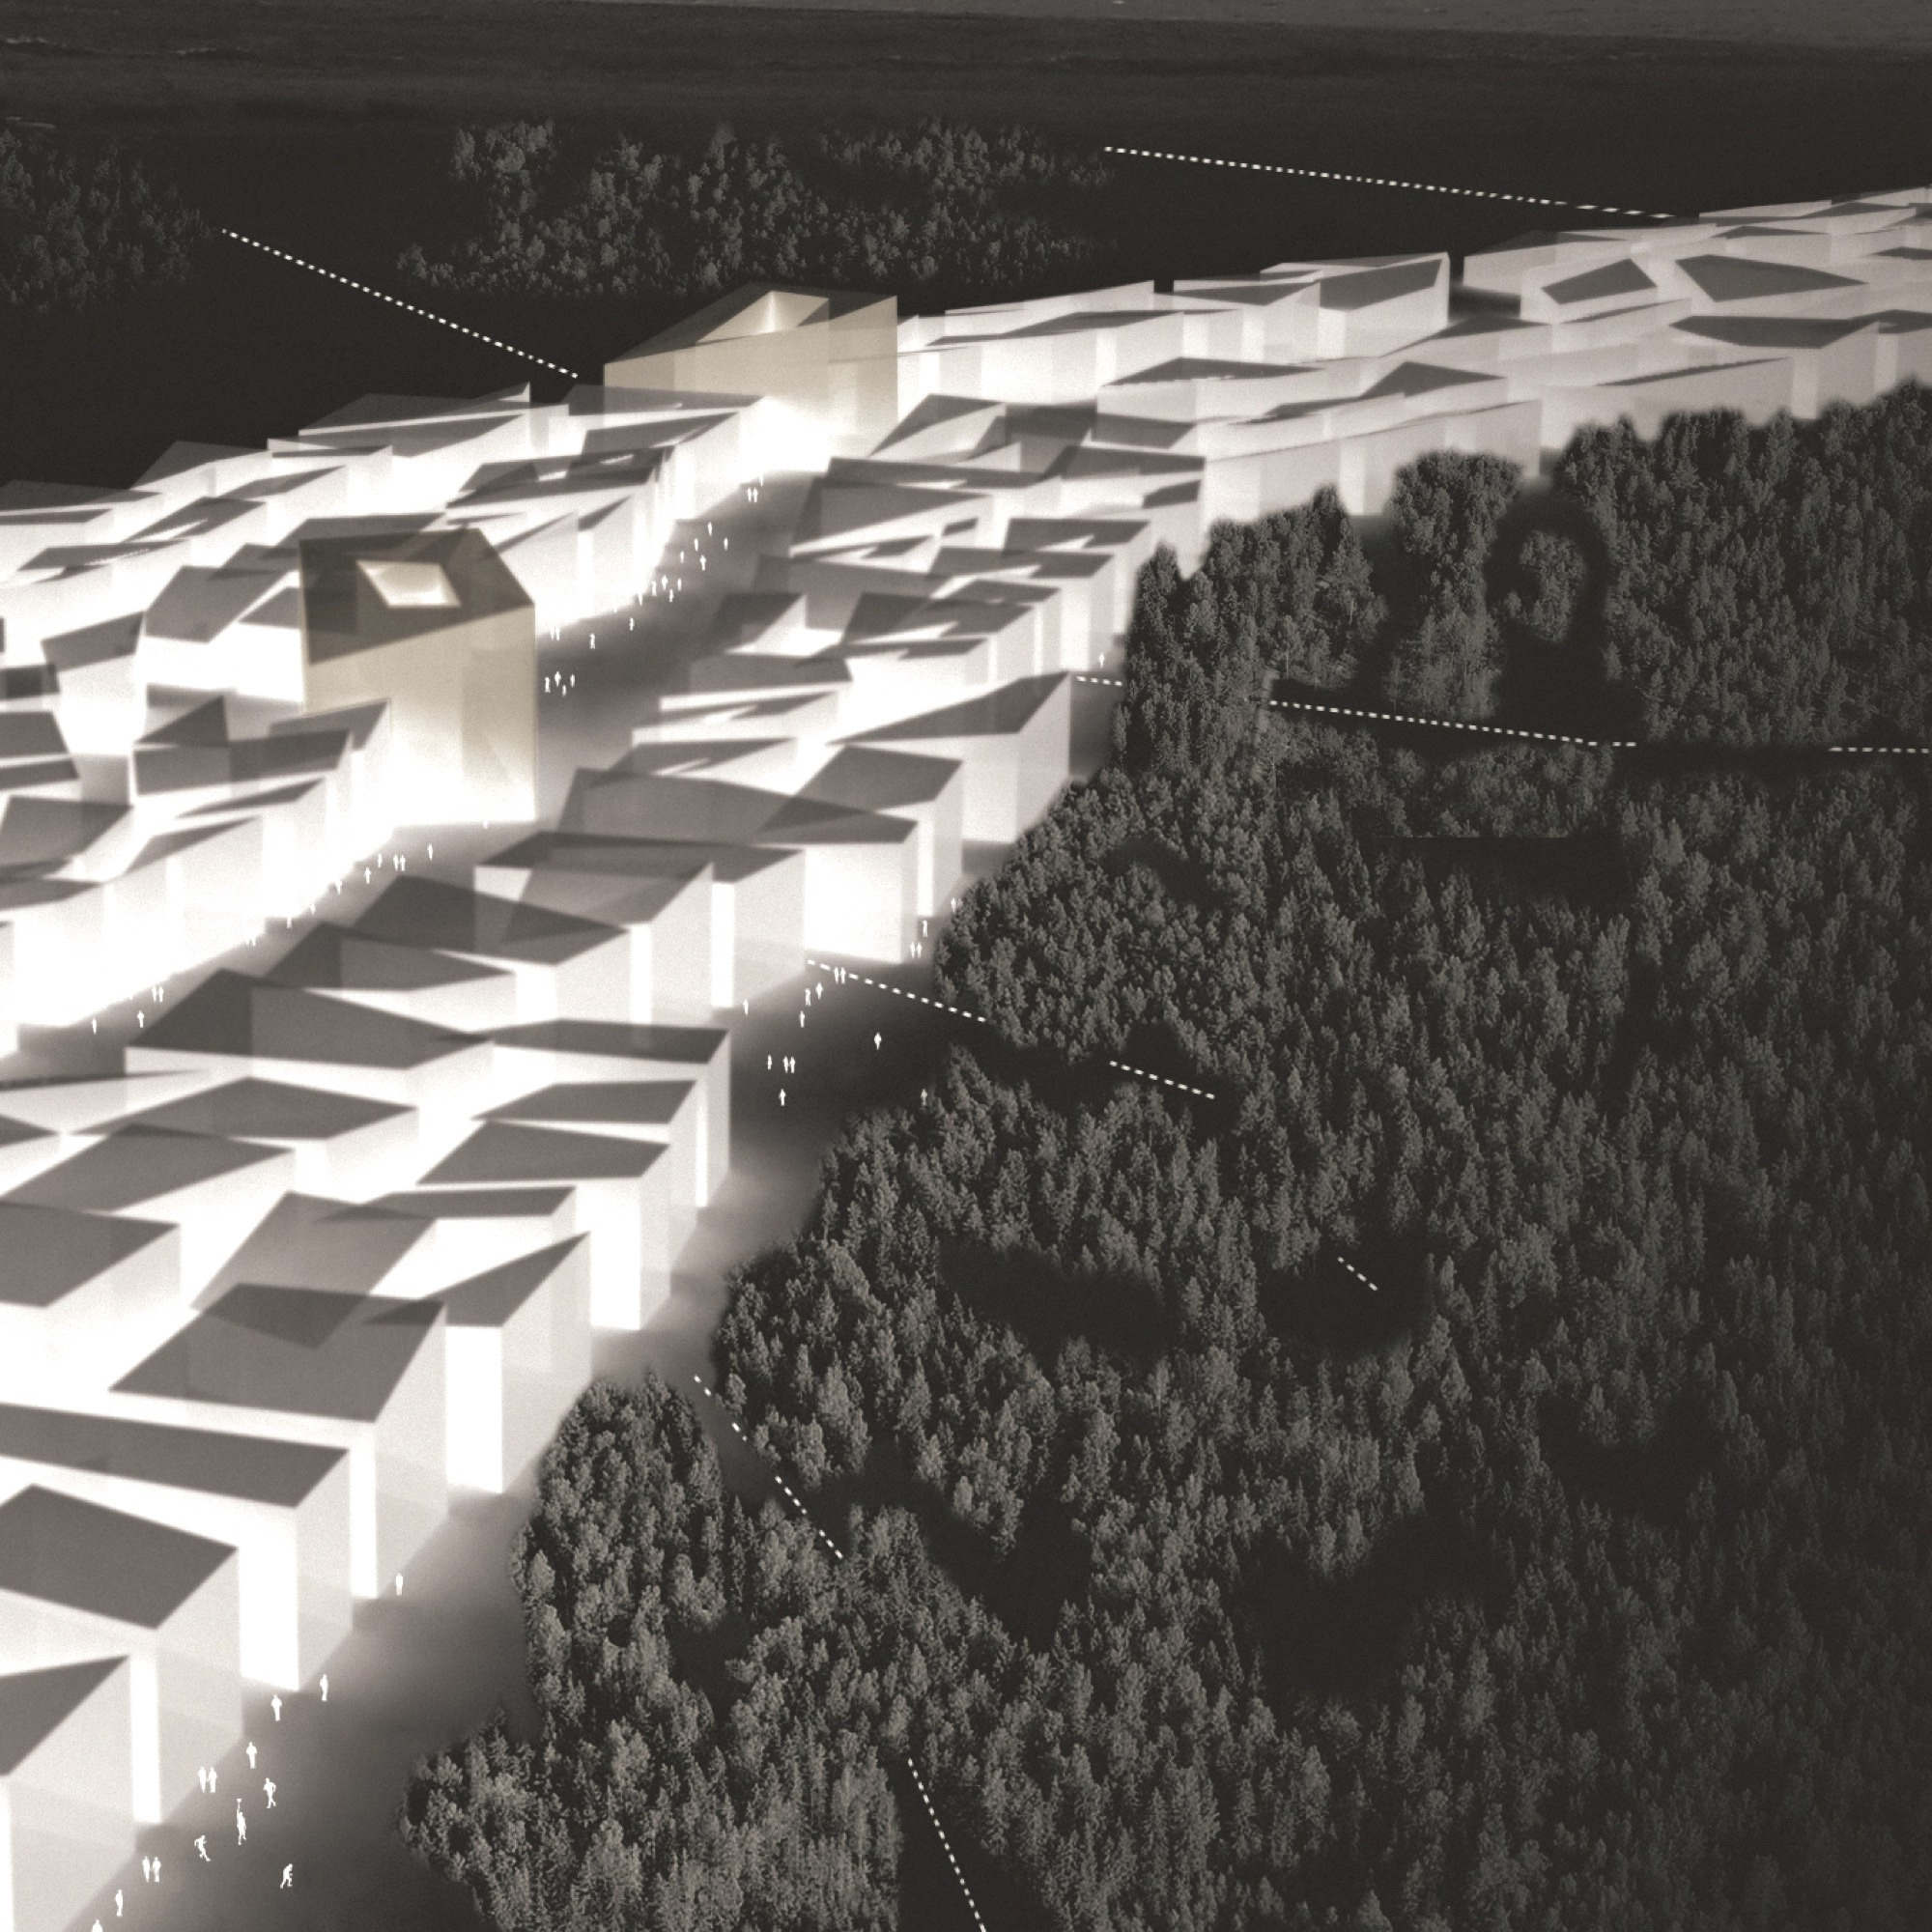 FUTURE CITY VISION